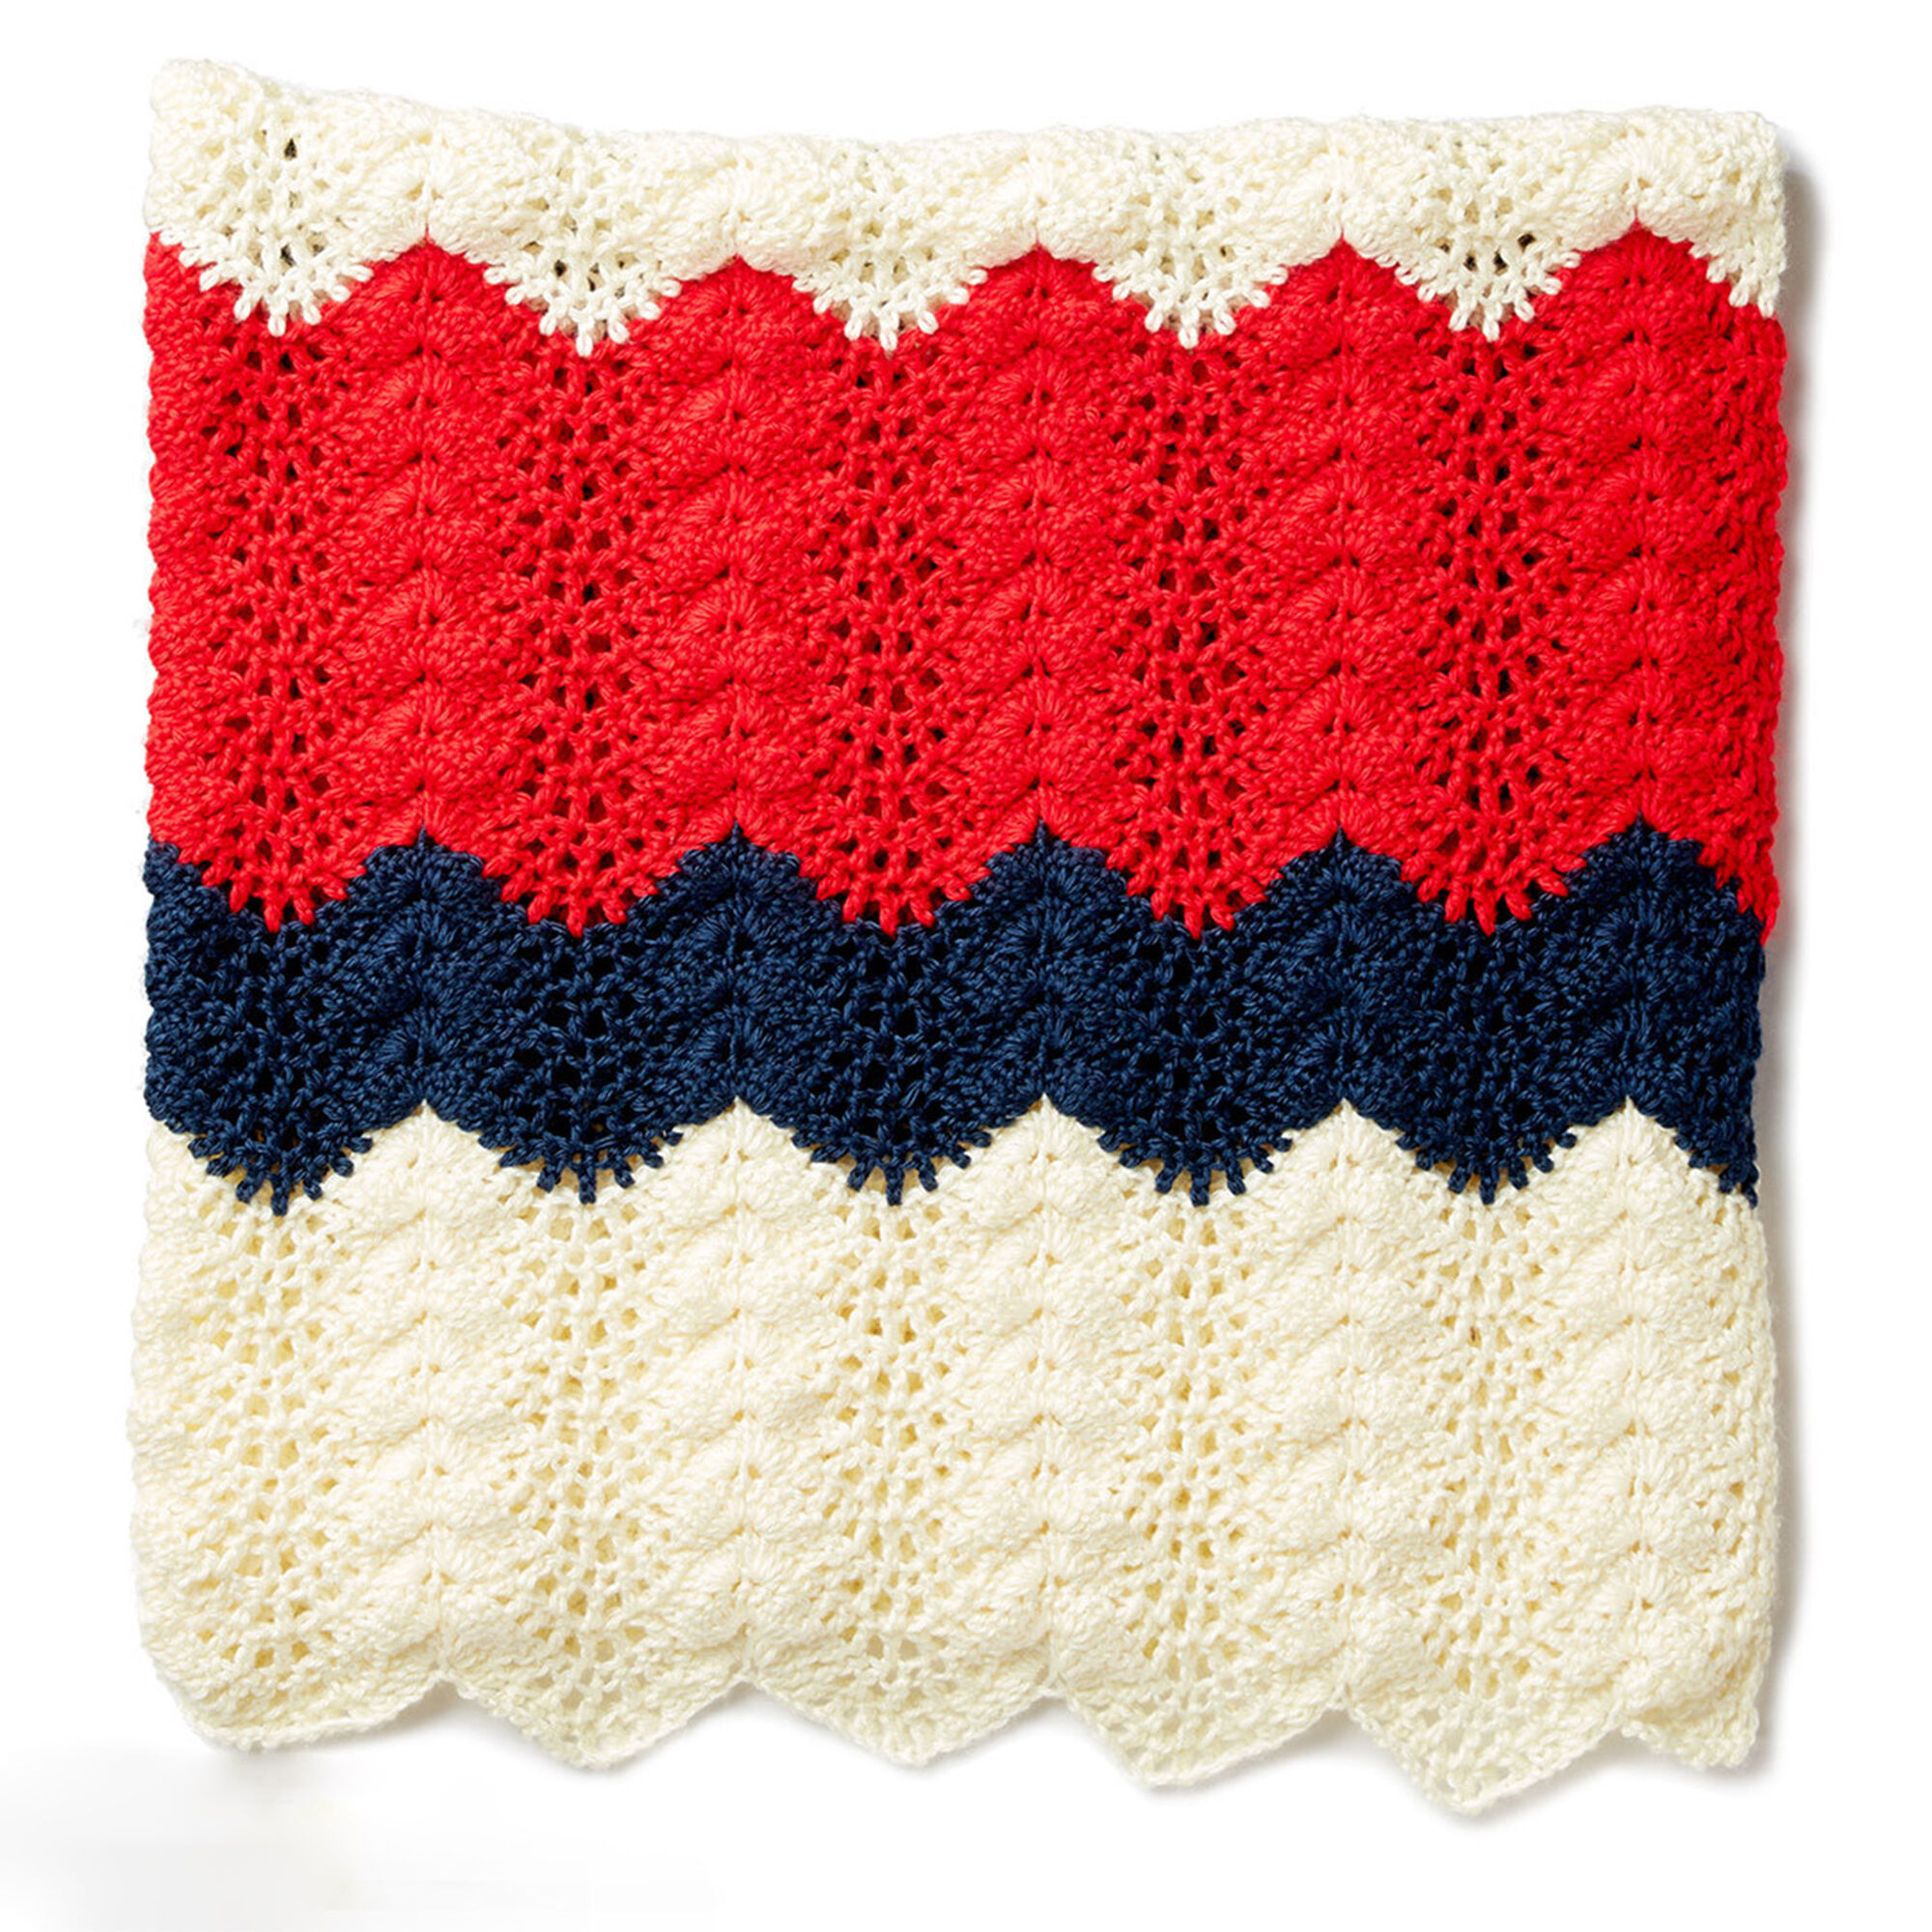 Caron Summer Ripple Crochet Blanket | Yarnspirations